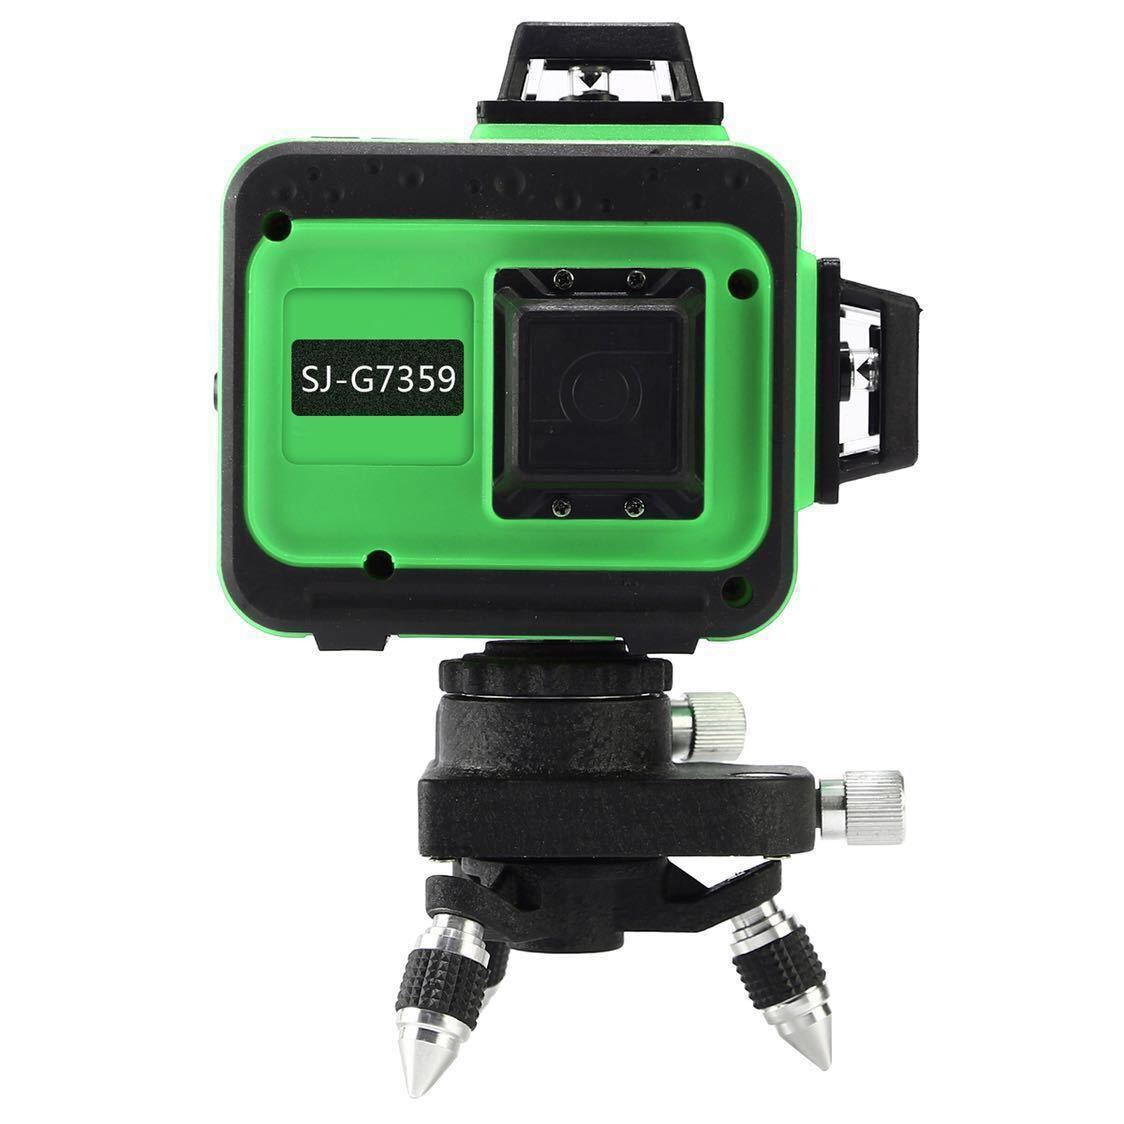 3D LASER 12ライン フルライングリーンレーザー墨出し器 360°垂直*2・360°水平*1グリーンレーザー墨出し器 レーザーレベル 水平器